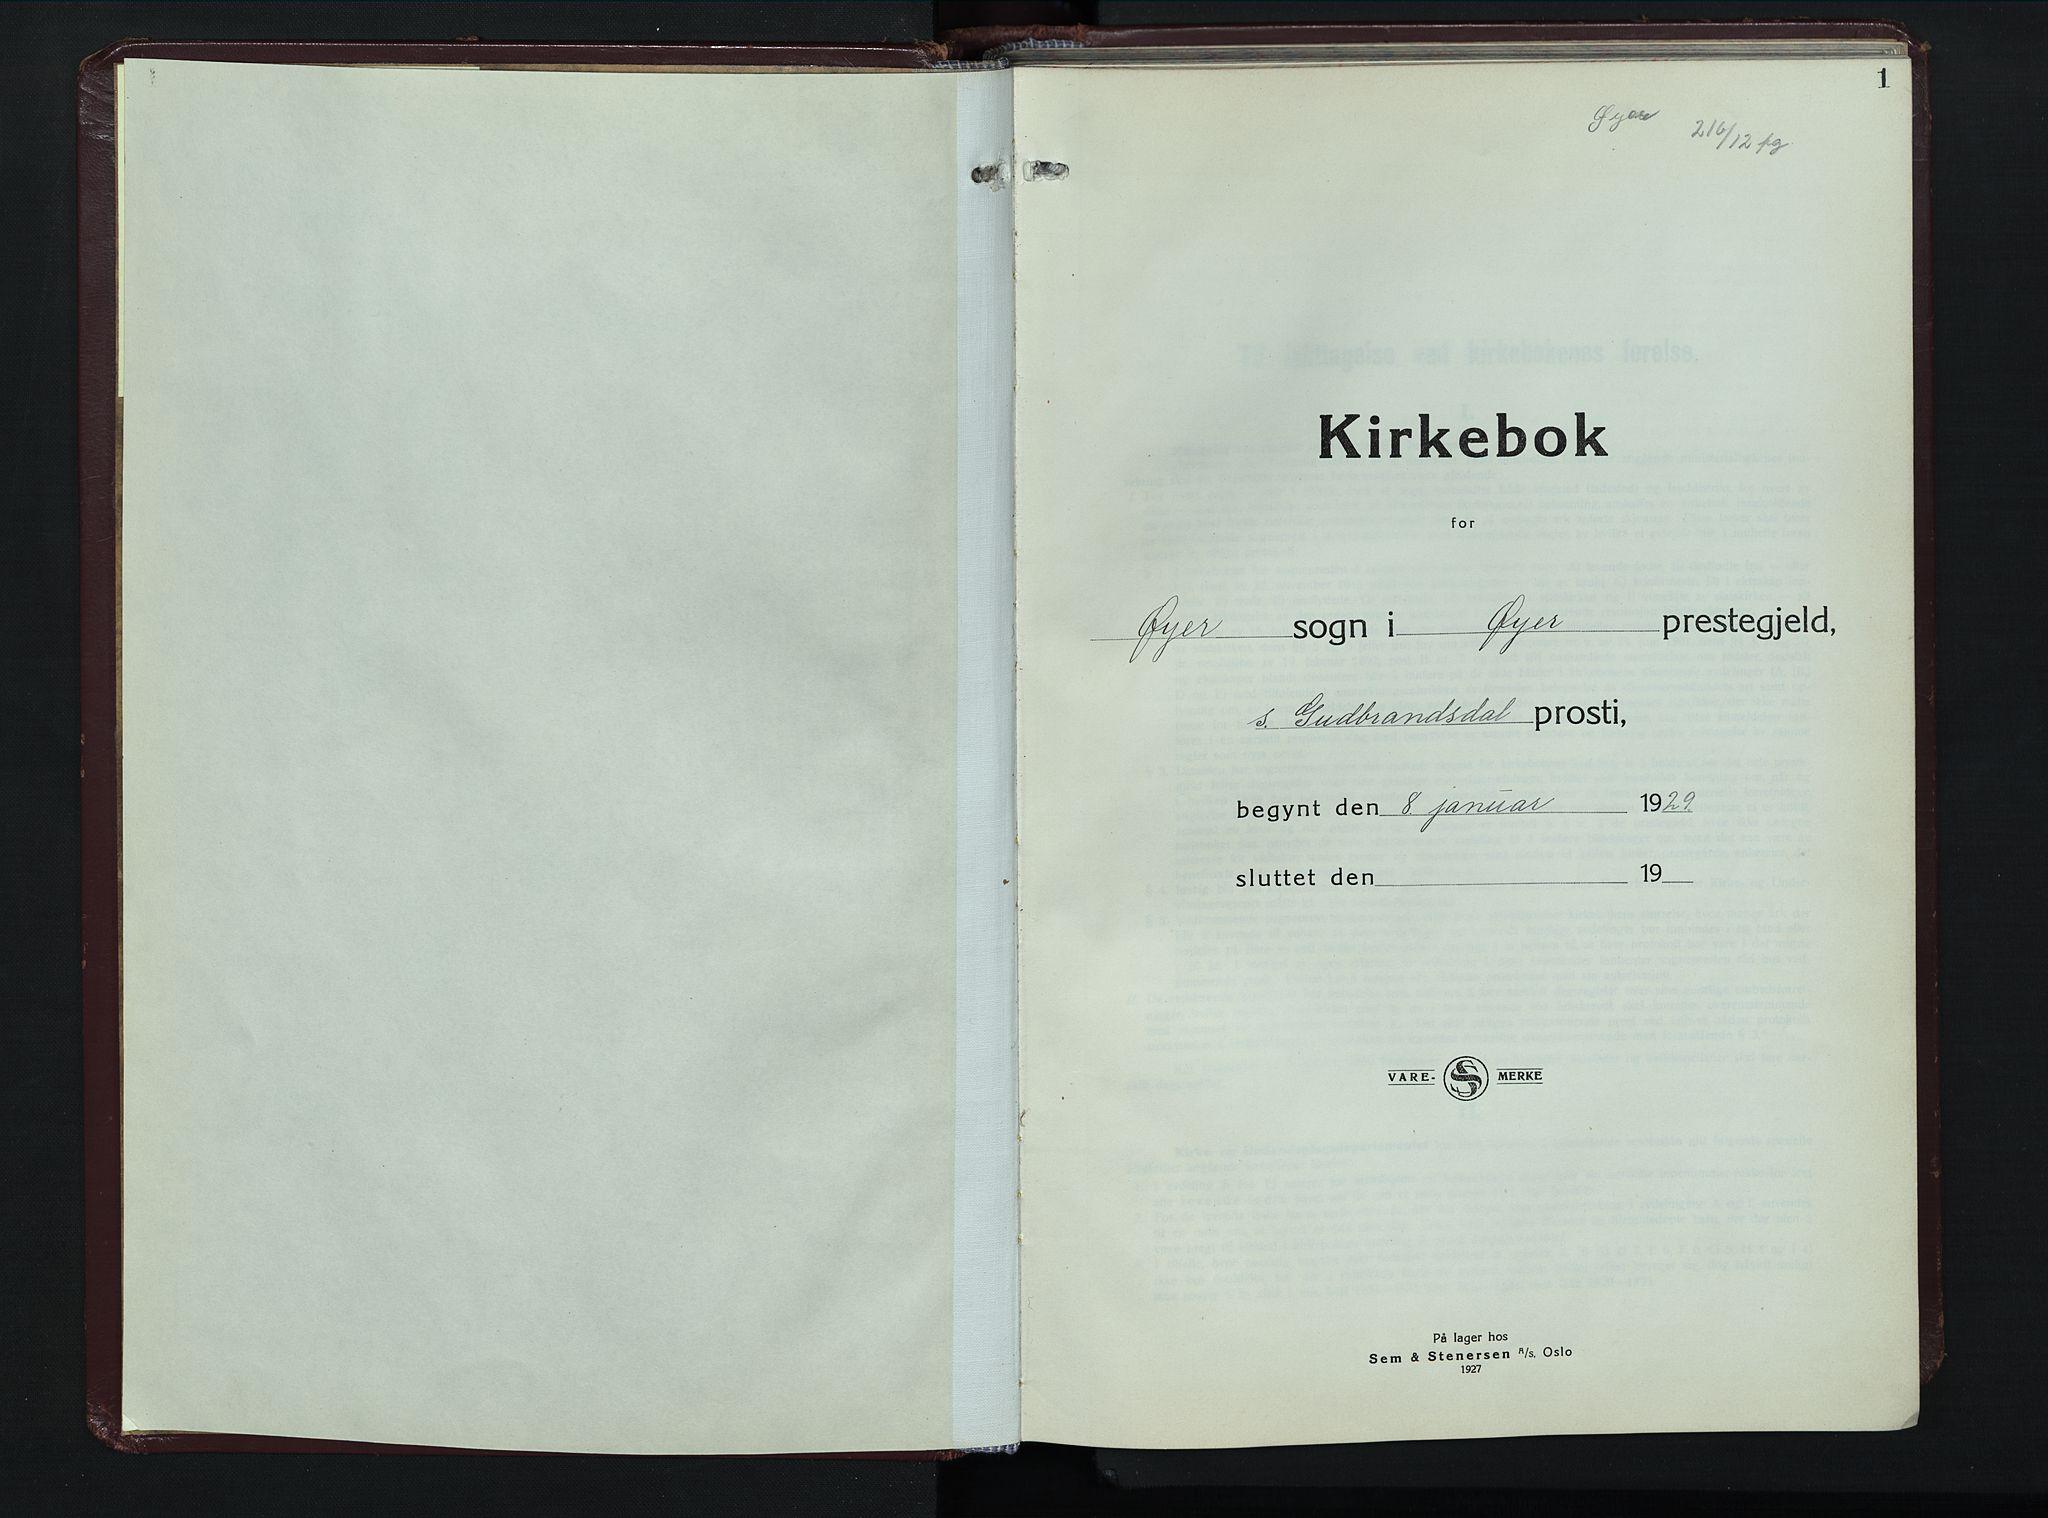 SAH, Øyer prestekontor, Klokkerbok nr. 8, 1929-1947, s. 1